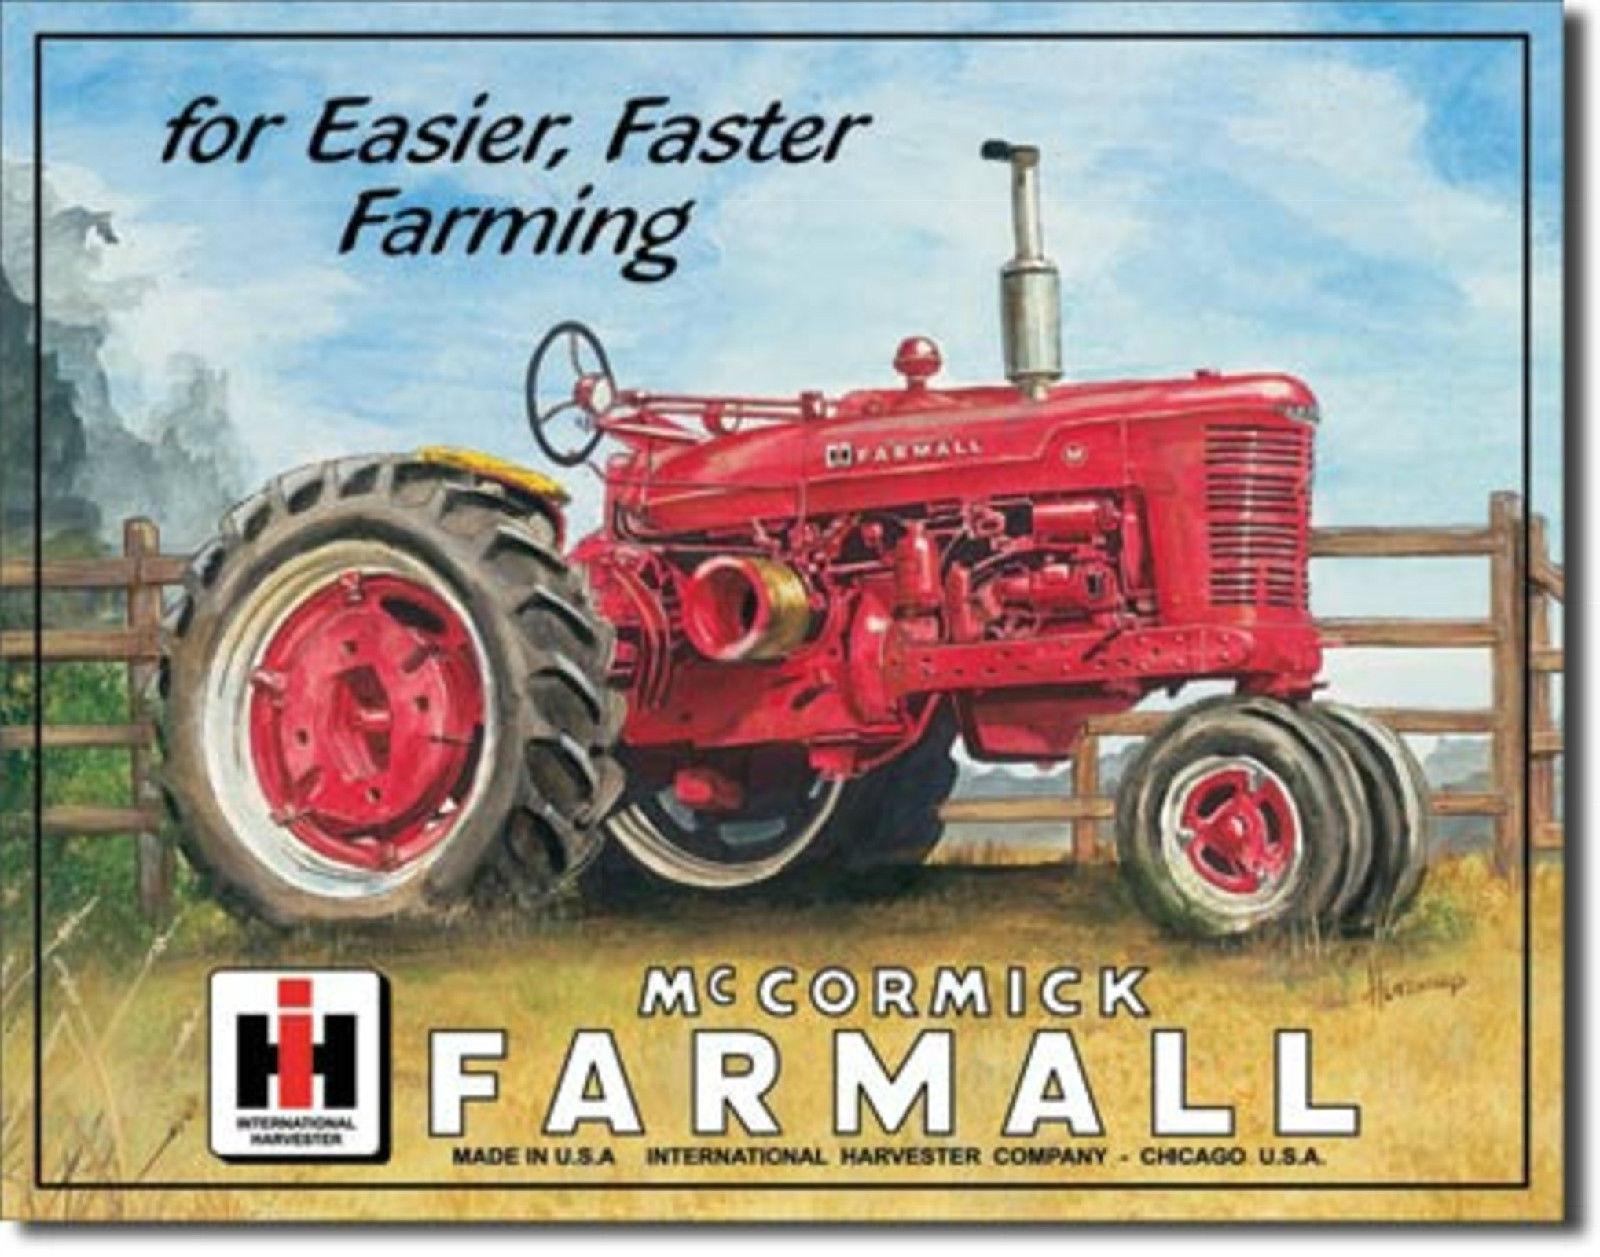 Farmall International Harvester IH Tractor  Metal Sign Tin New Vintage Style 825